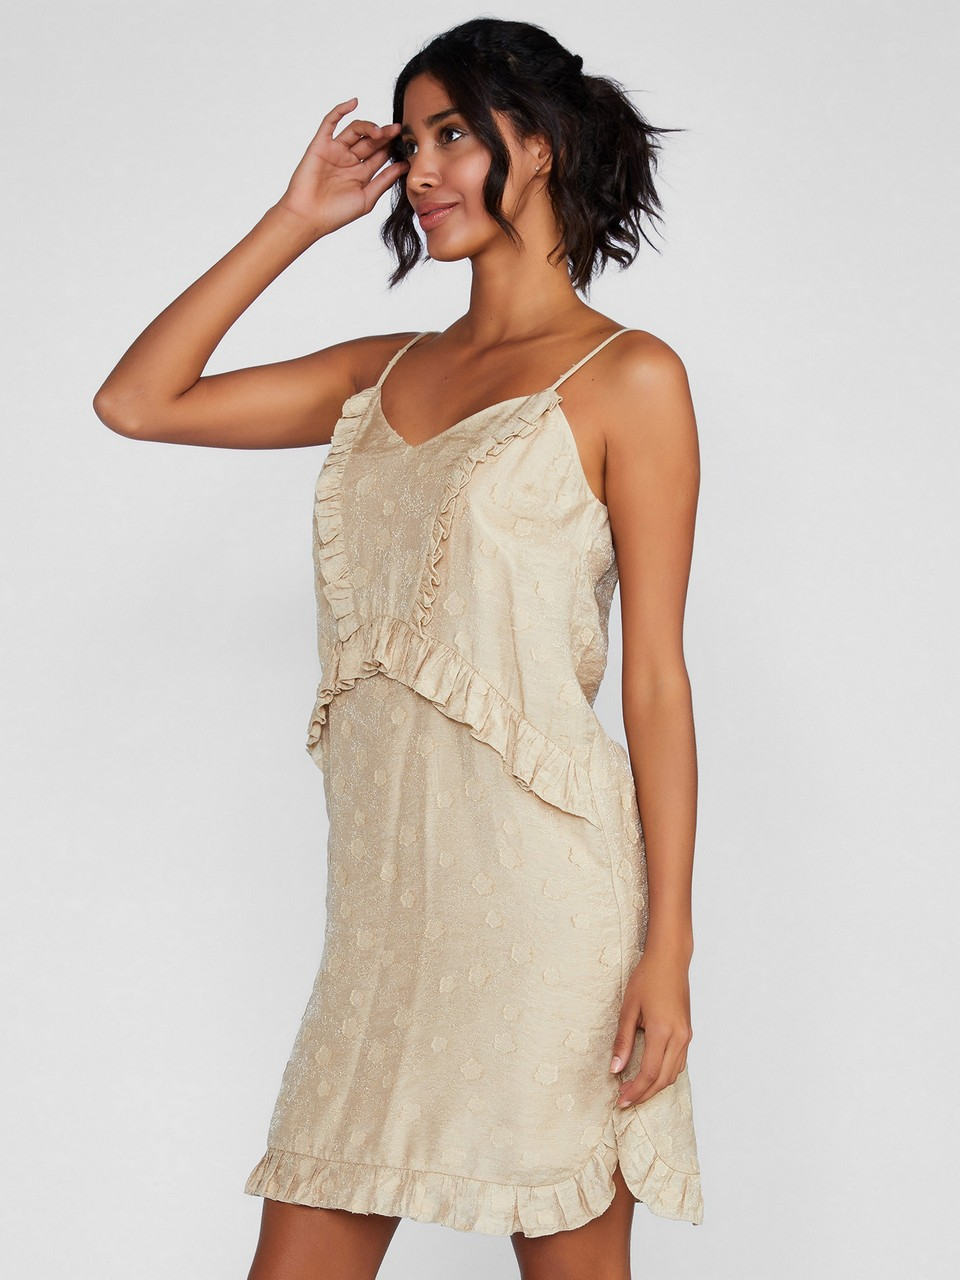 İp Askılı İpekli Elbise